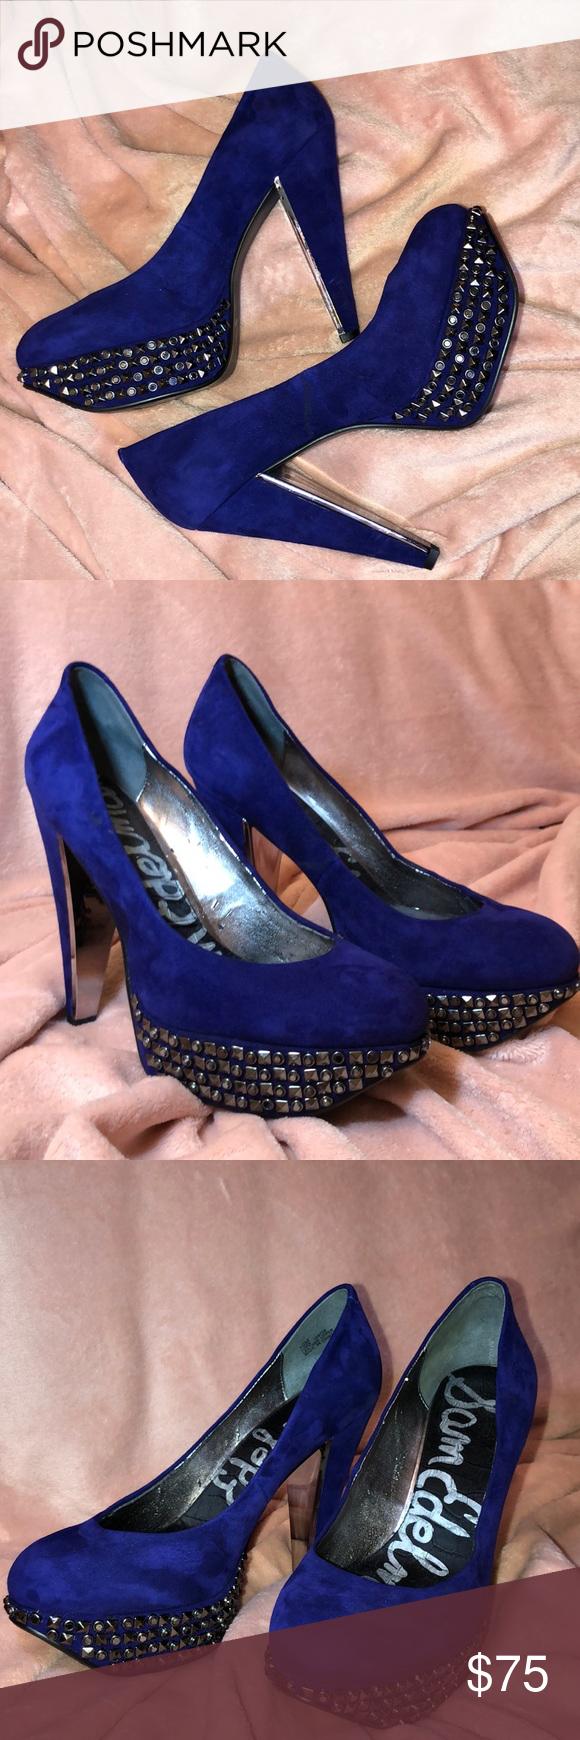 Sam Edelman suede royal blue heels in